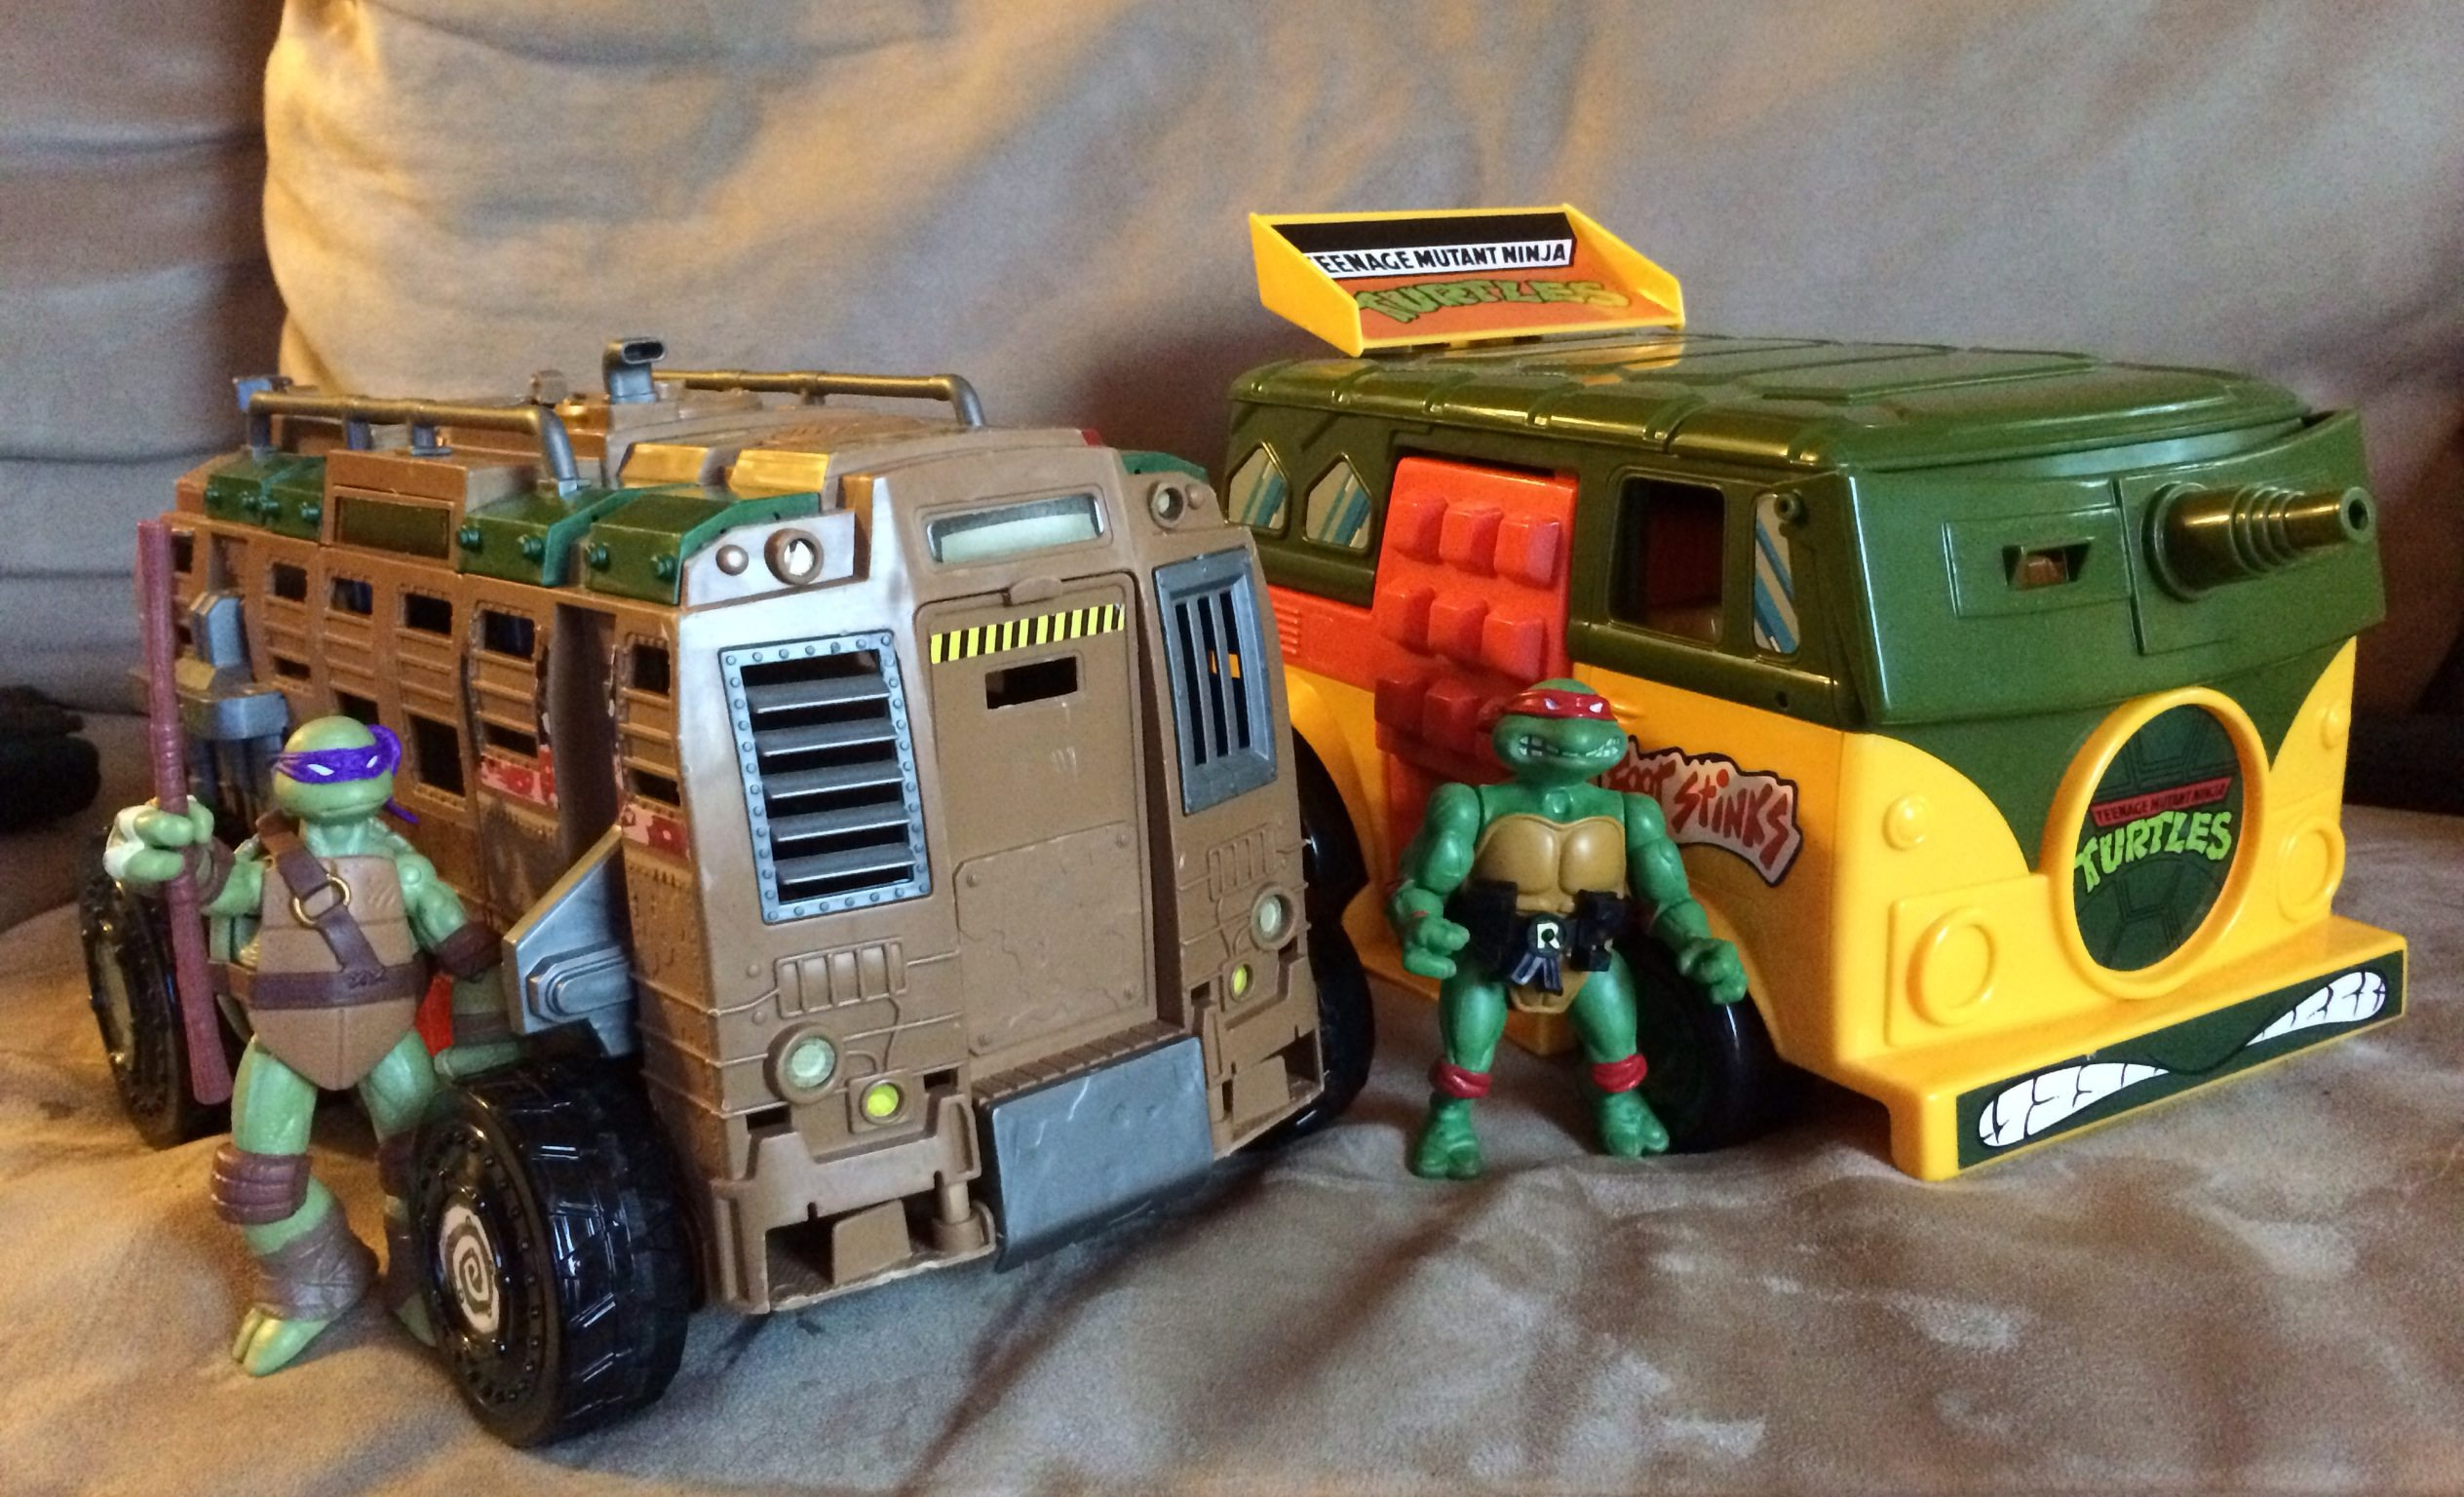 My son's TMNT toys (left) and my TMNT toys (right).  Image: Dakster Sullivan